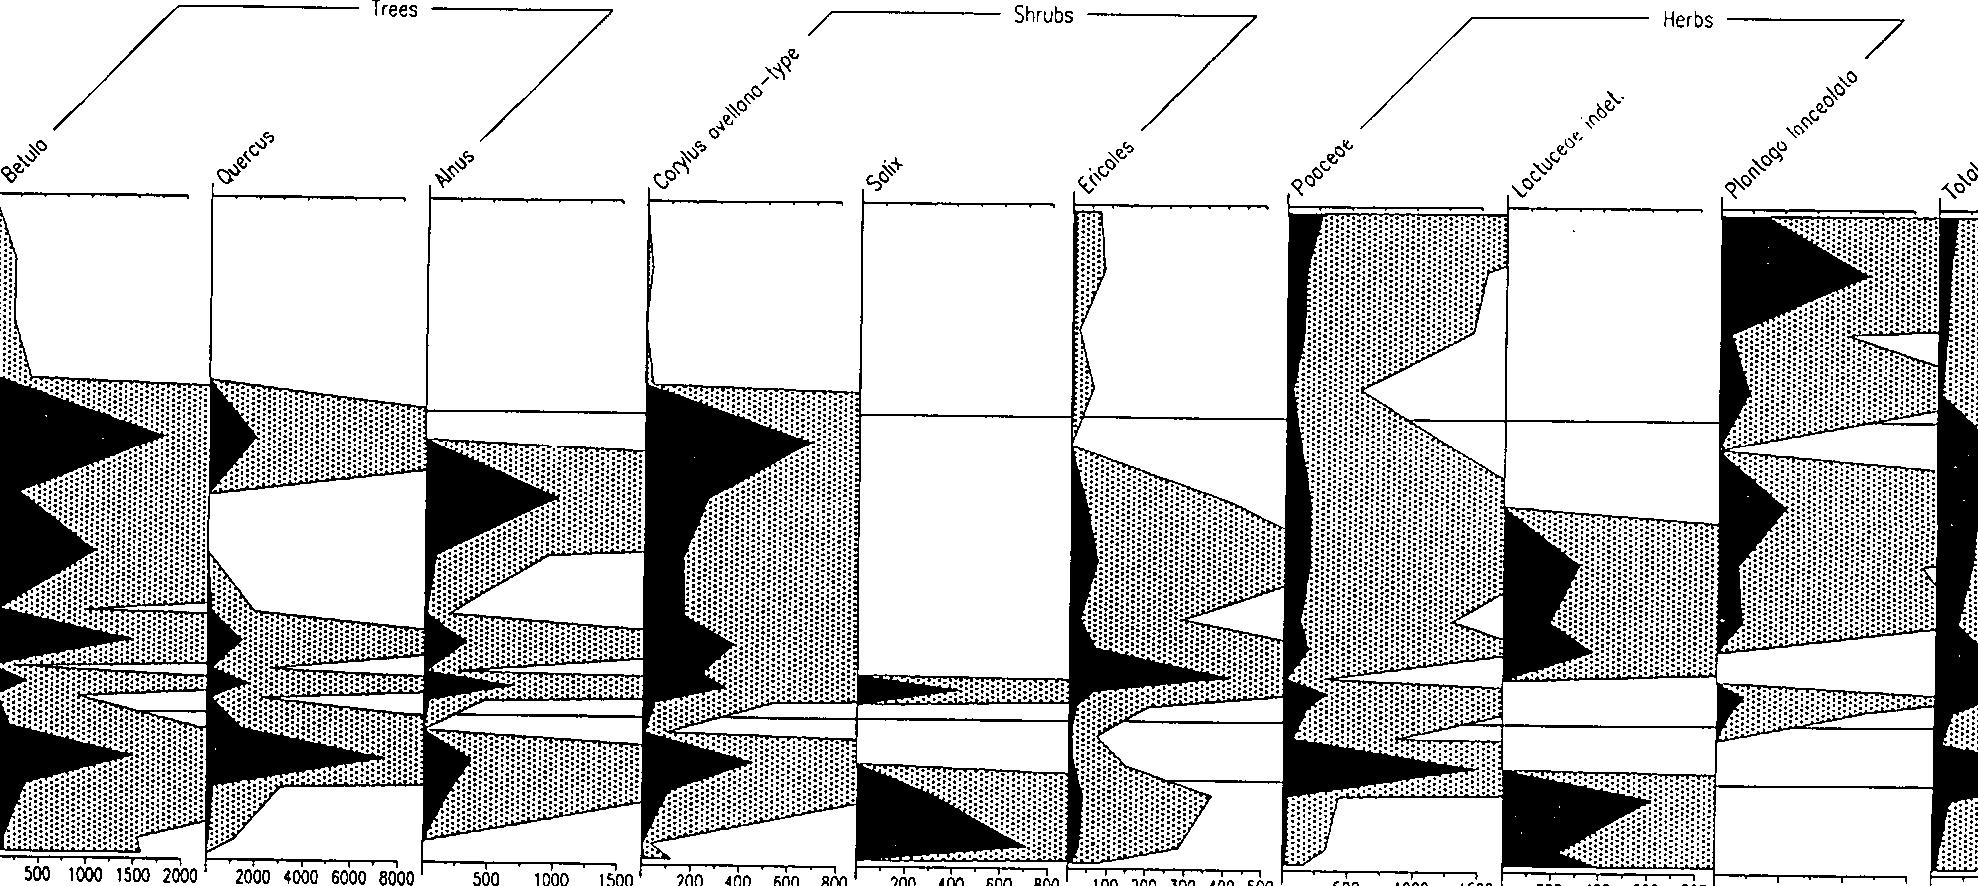 figure 4,7